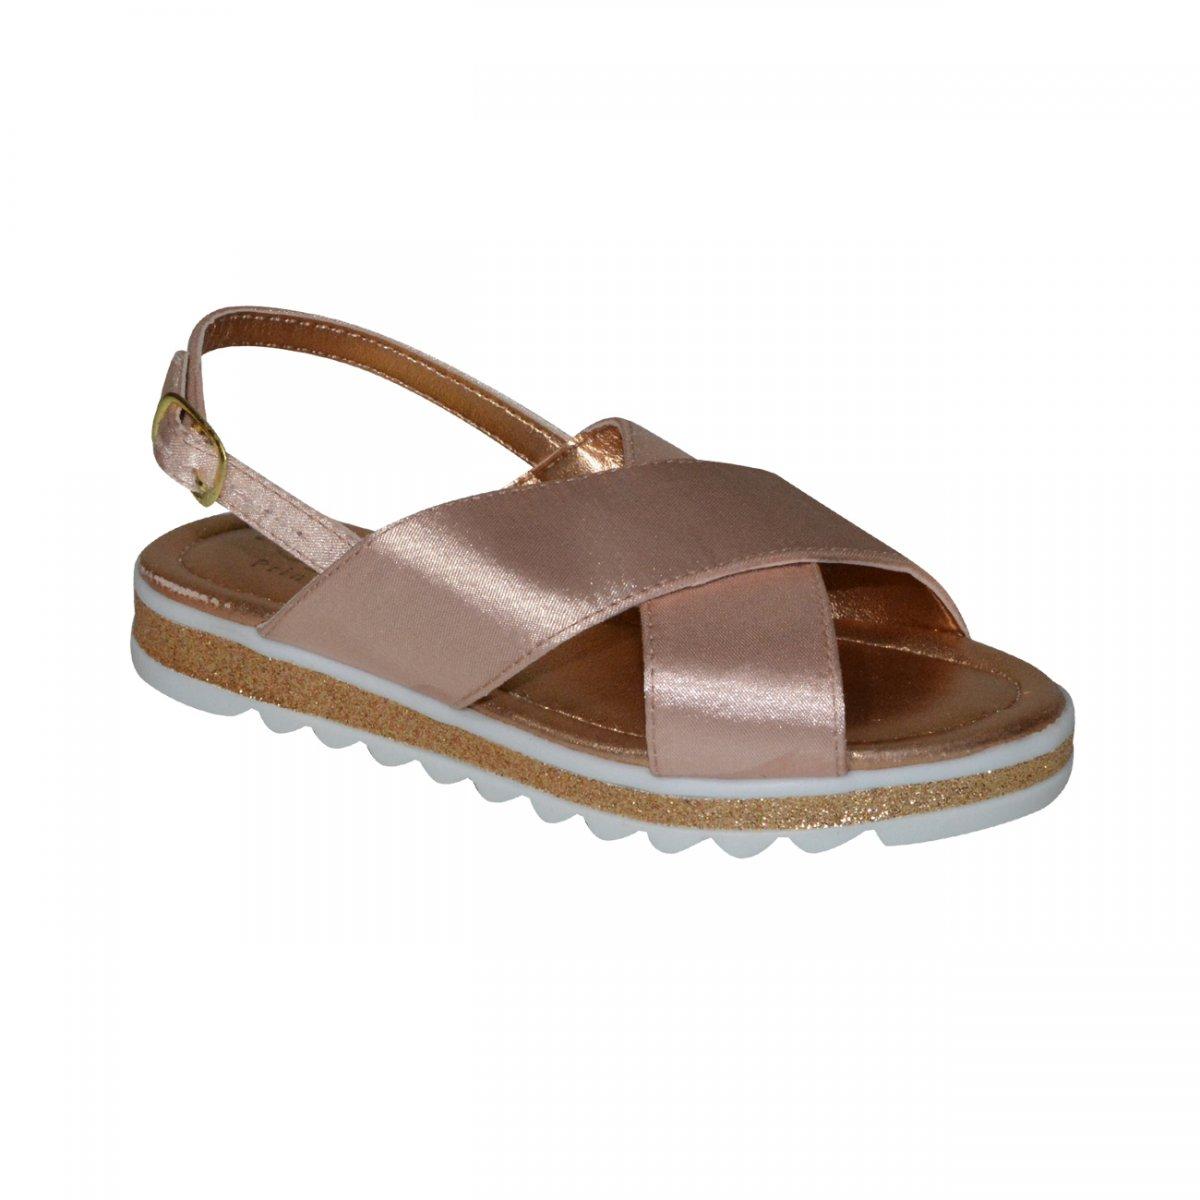 5a1074db05 Sandalia Klassipe Gloss 146.105 Infantil 146.105.993 - Nude - Chuteira  Nike